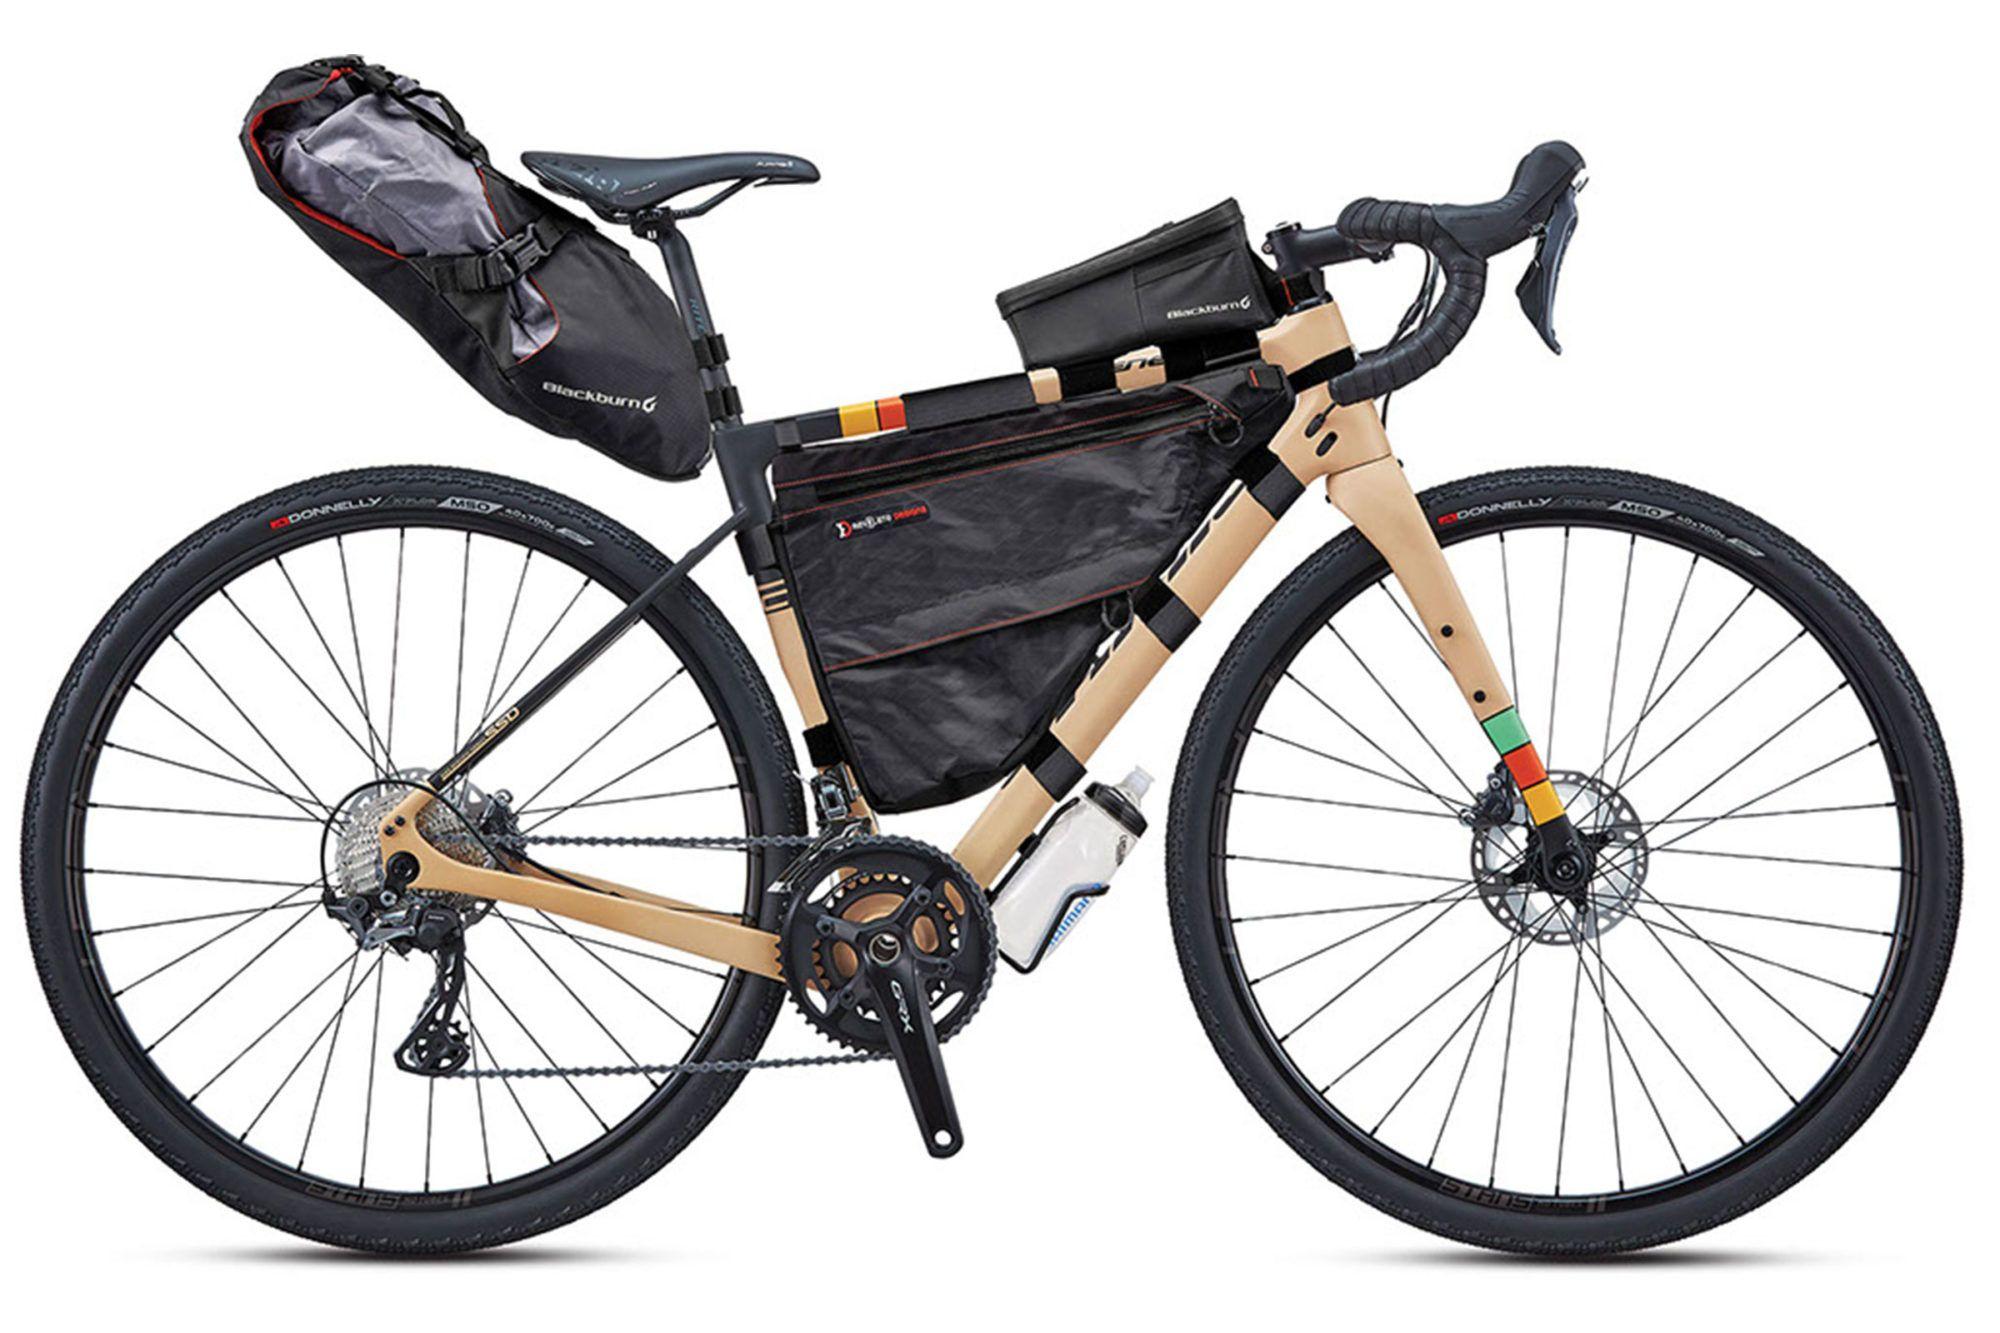 Introducing The New Jamis Renegade C1 And C2 In 2020 Bikepacking